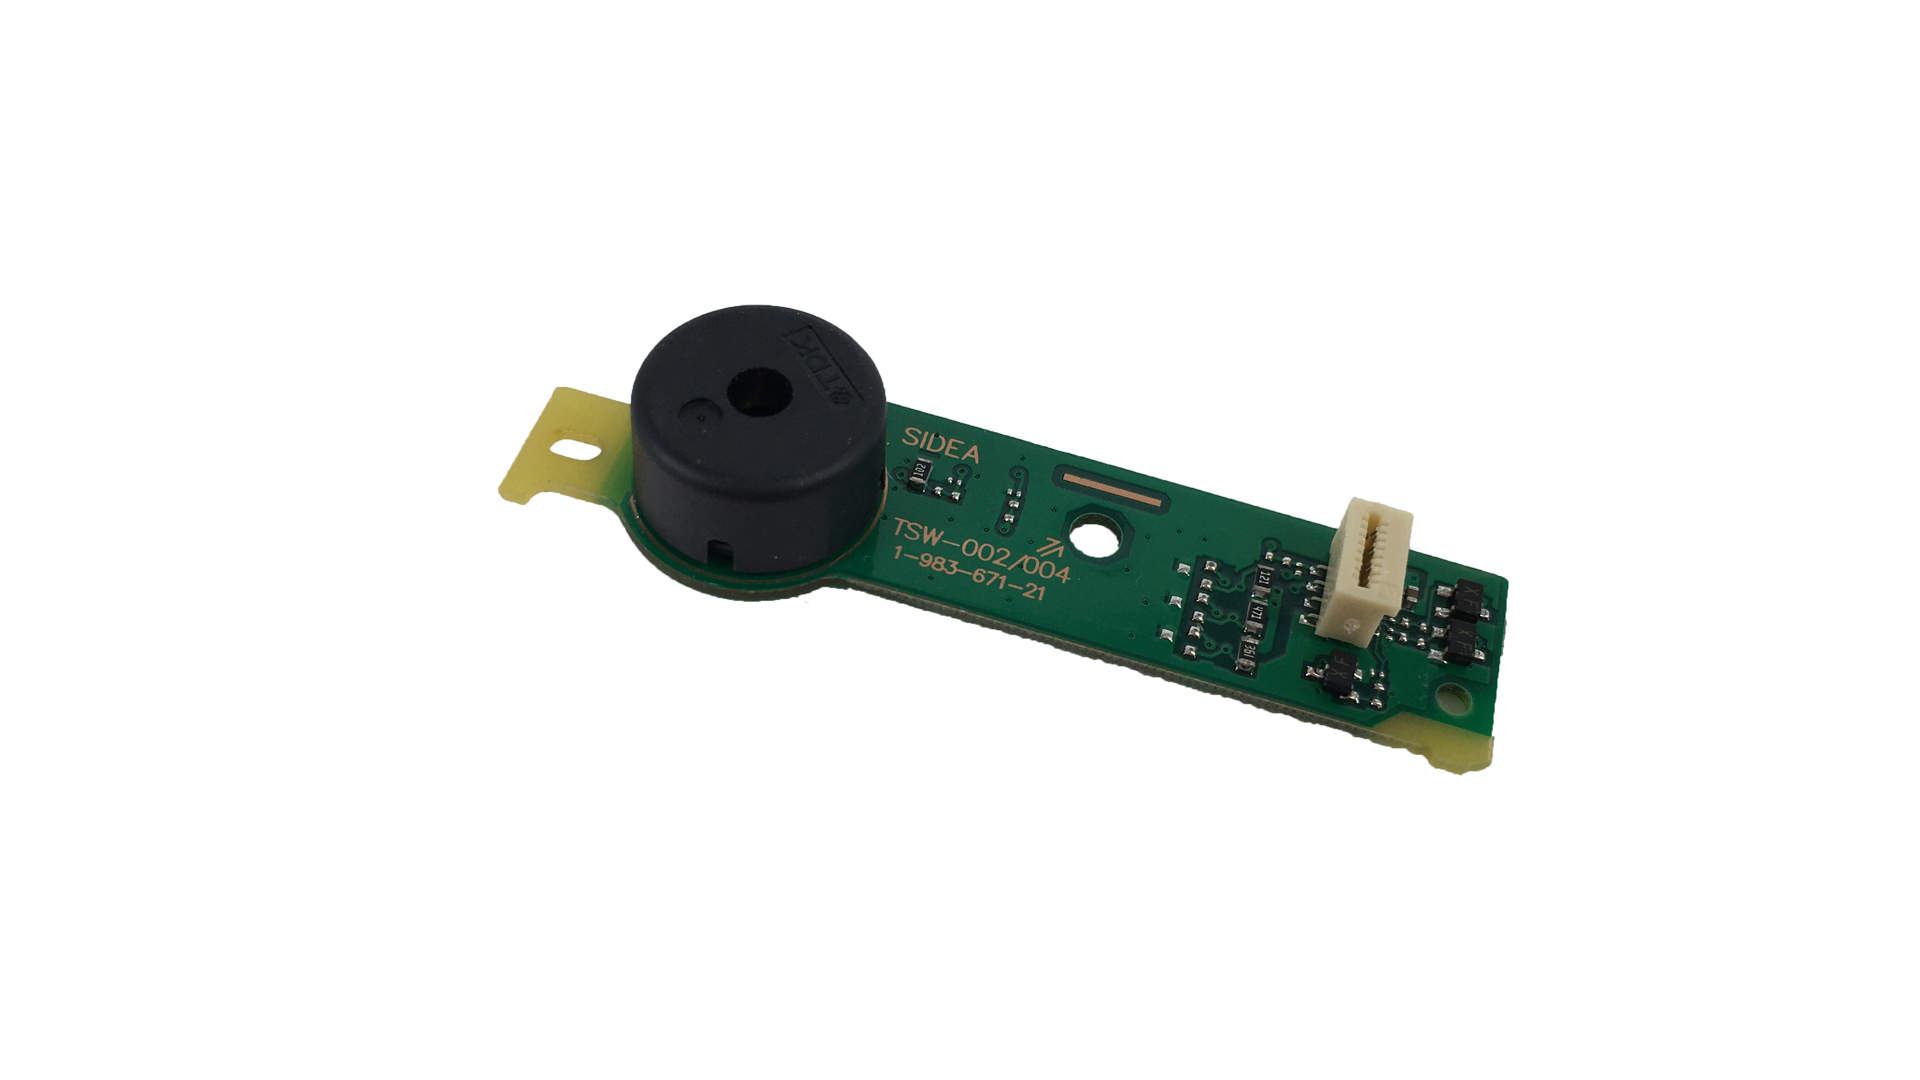 PS4 SLIM TSW-002 Ενεργοποίηση / απενεργοποίηση Εξαγωγή με κορδέλα Flex Cable